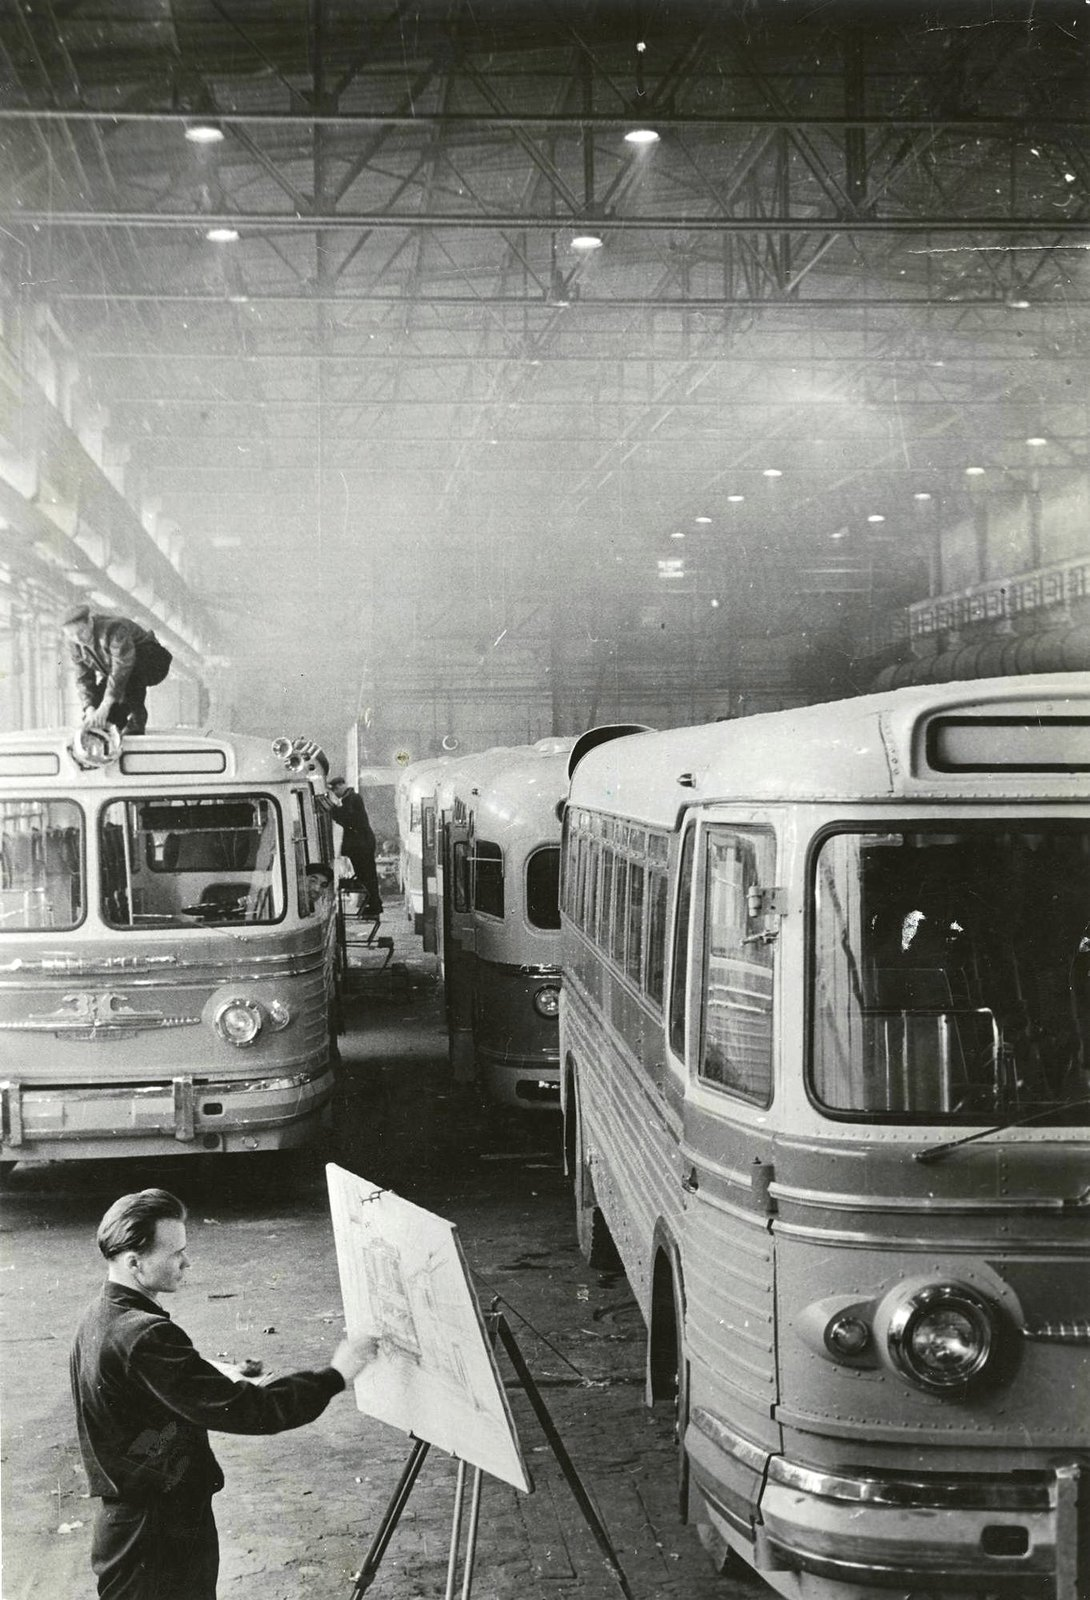 1955. Завод им. Лихачева. ИЗО студия